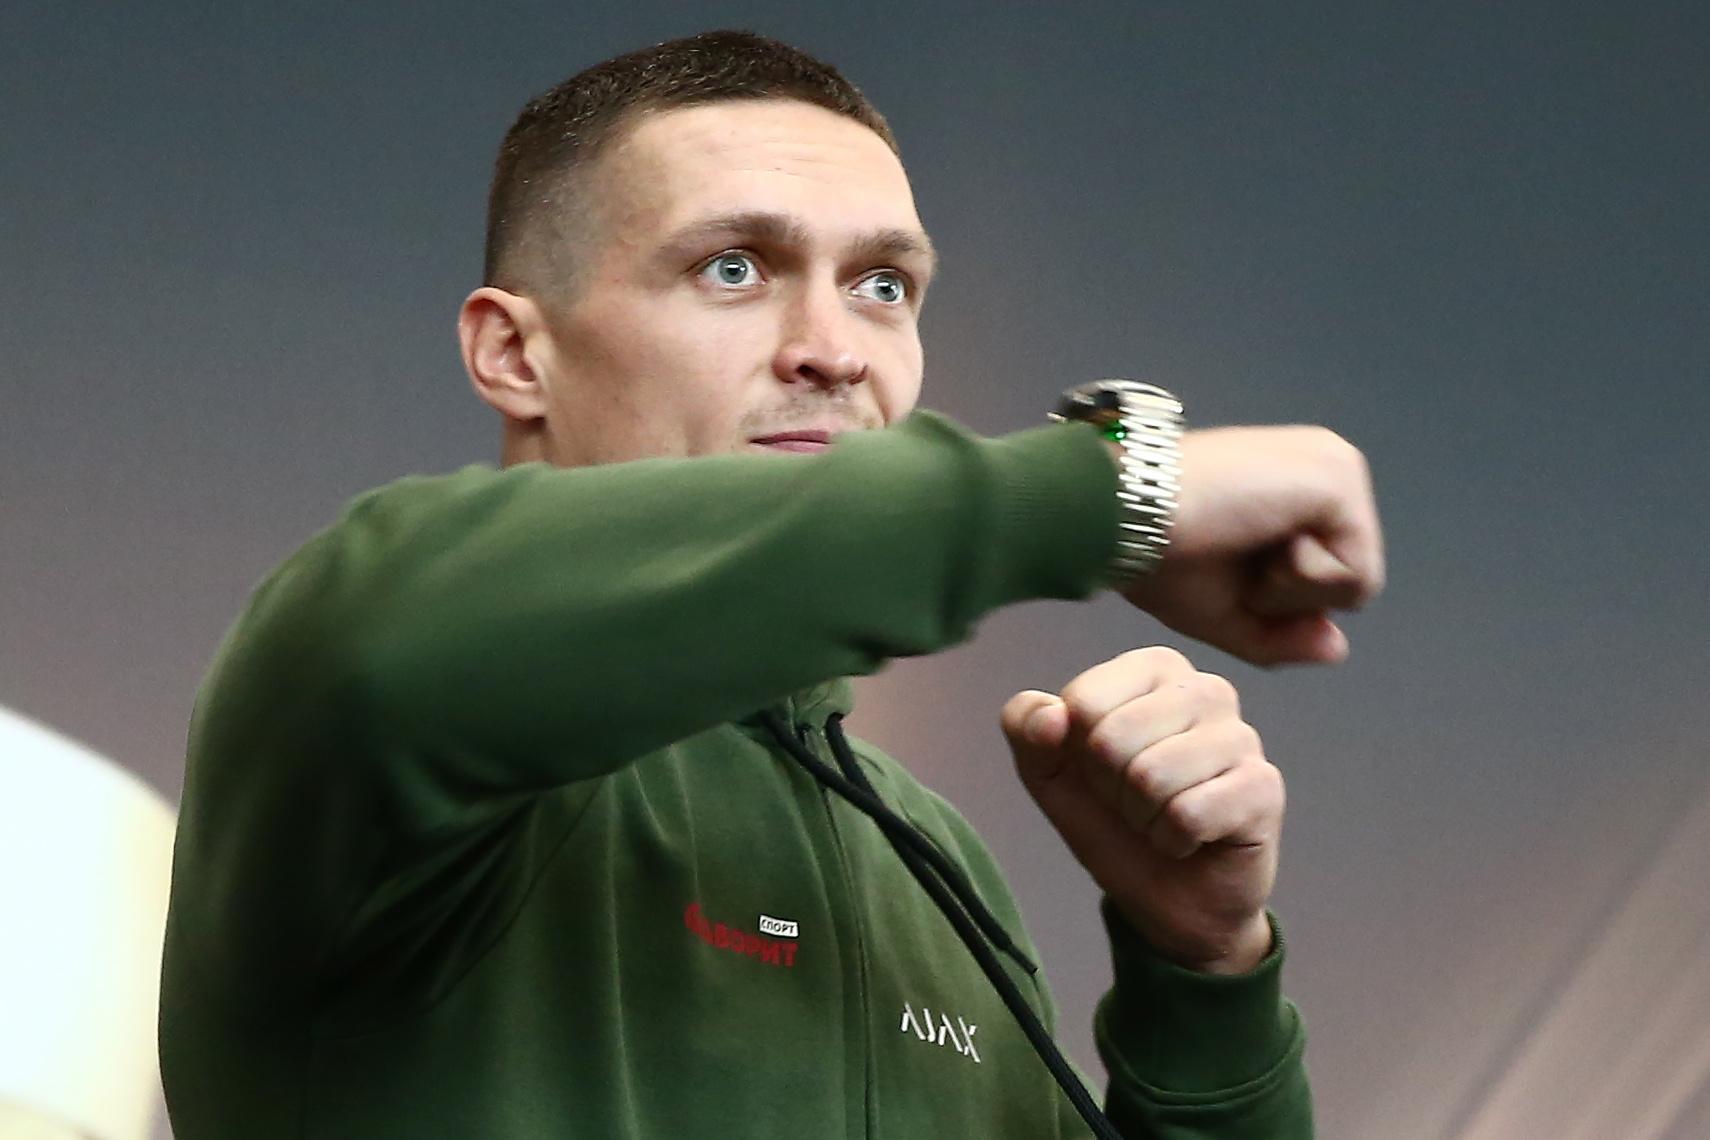 Ukrainian boxer Oleksandr Usyk gives open training session